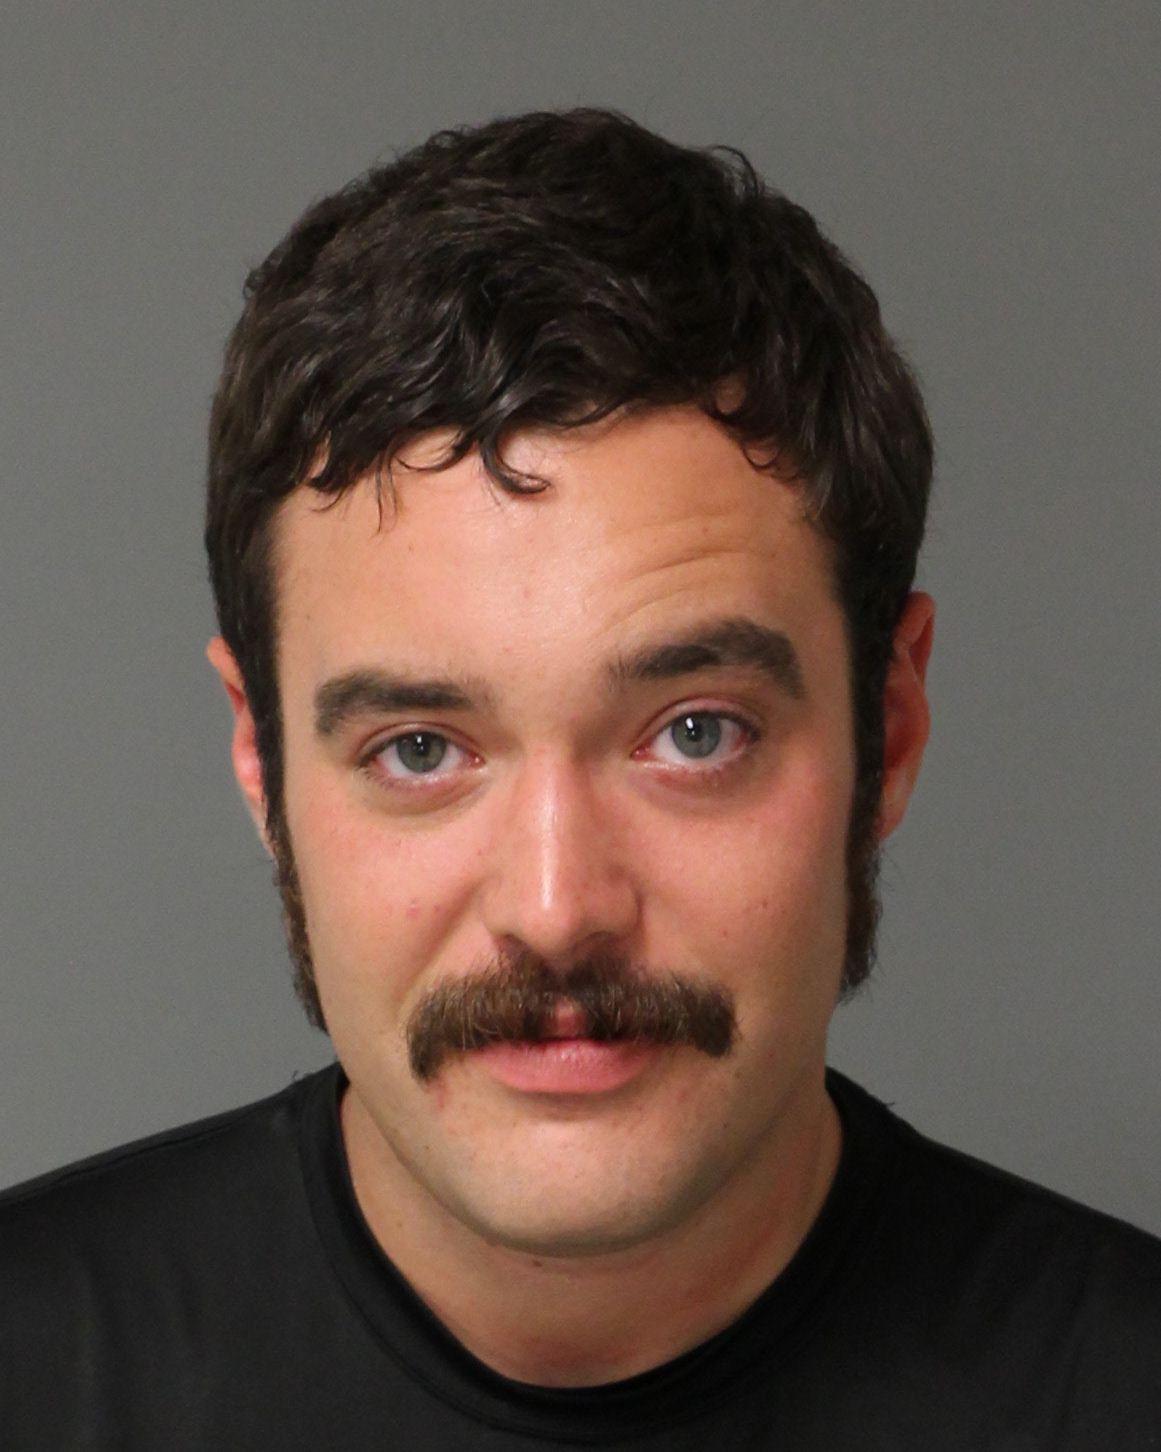 JORDAN CALEB WOODELL Mugshot / County Arrests / Wake County Arrests